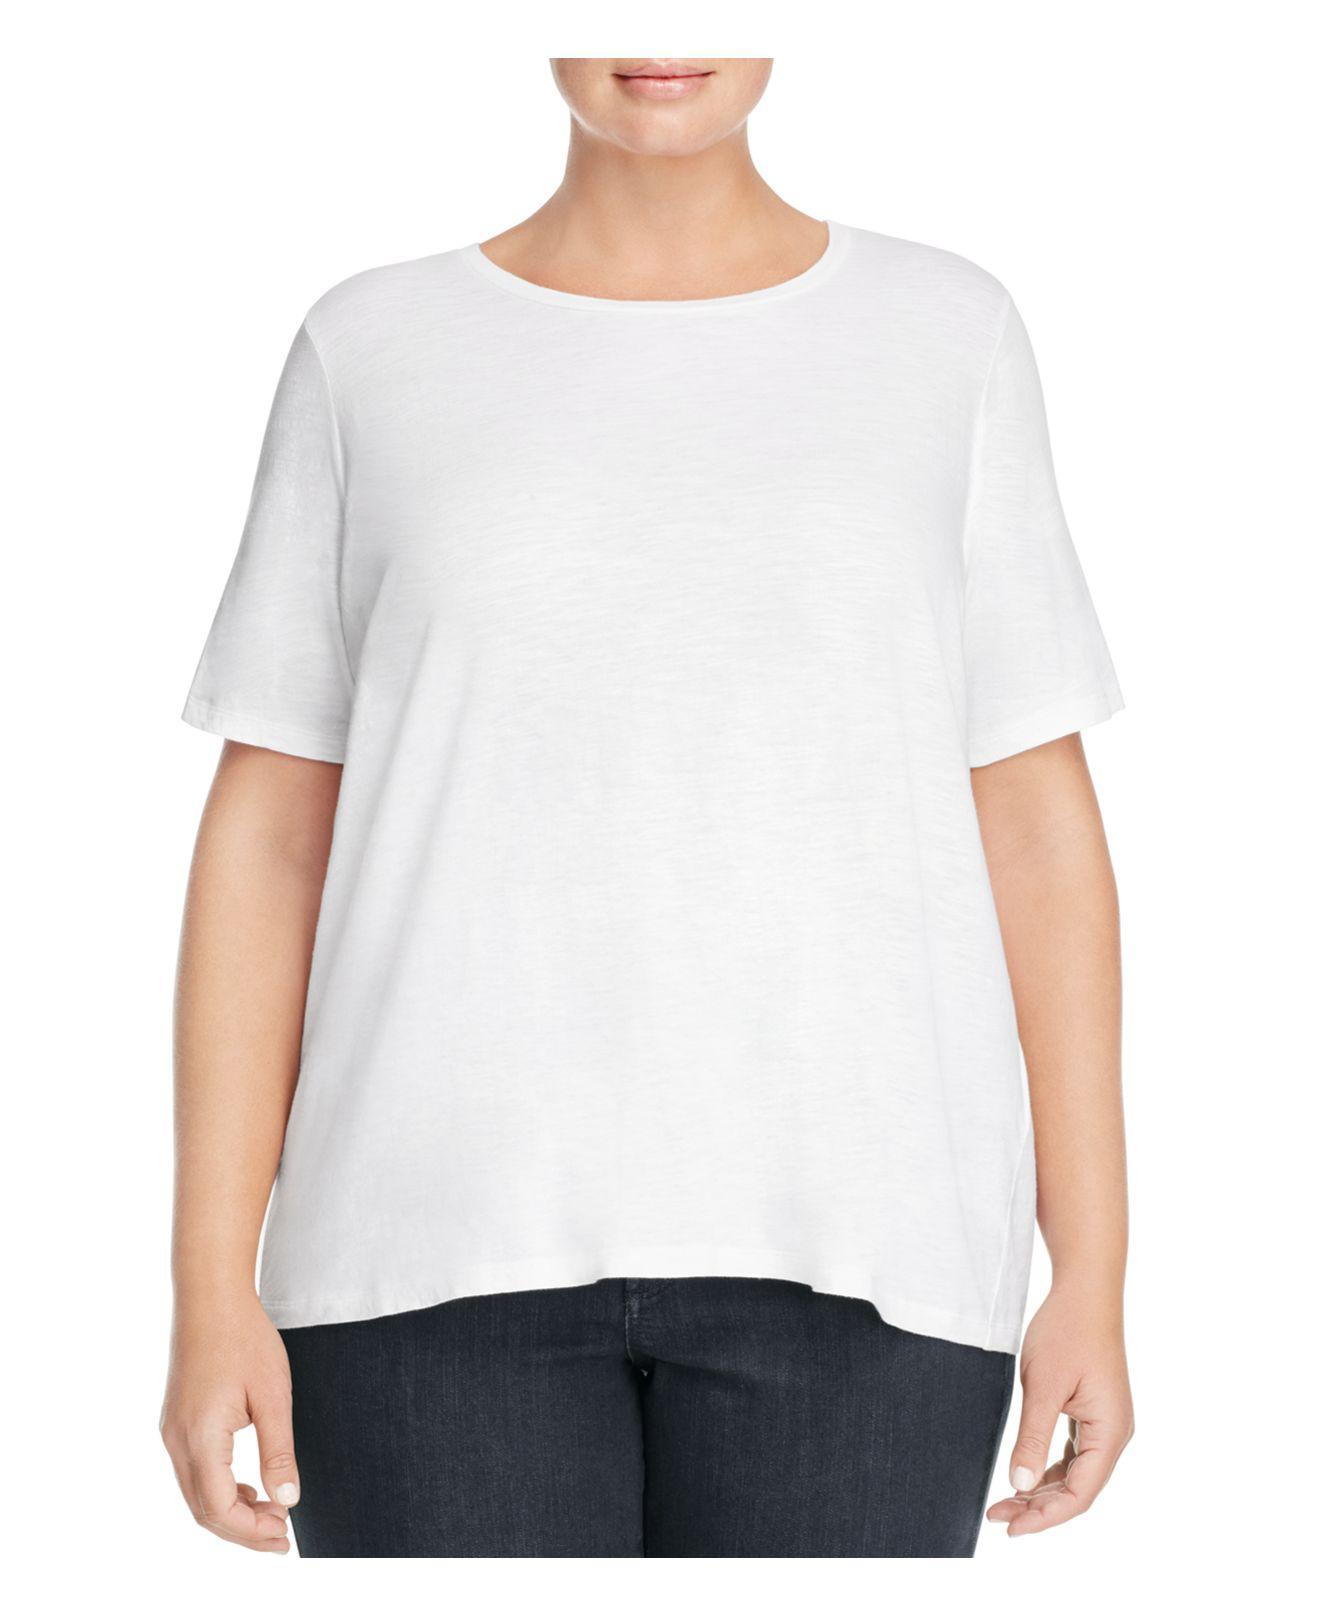 Lyst eileen fisher organic cotton heathered tee in white for Eileen fisher organic cotton t shirt